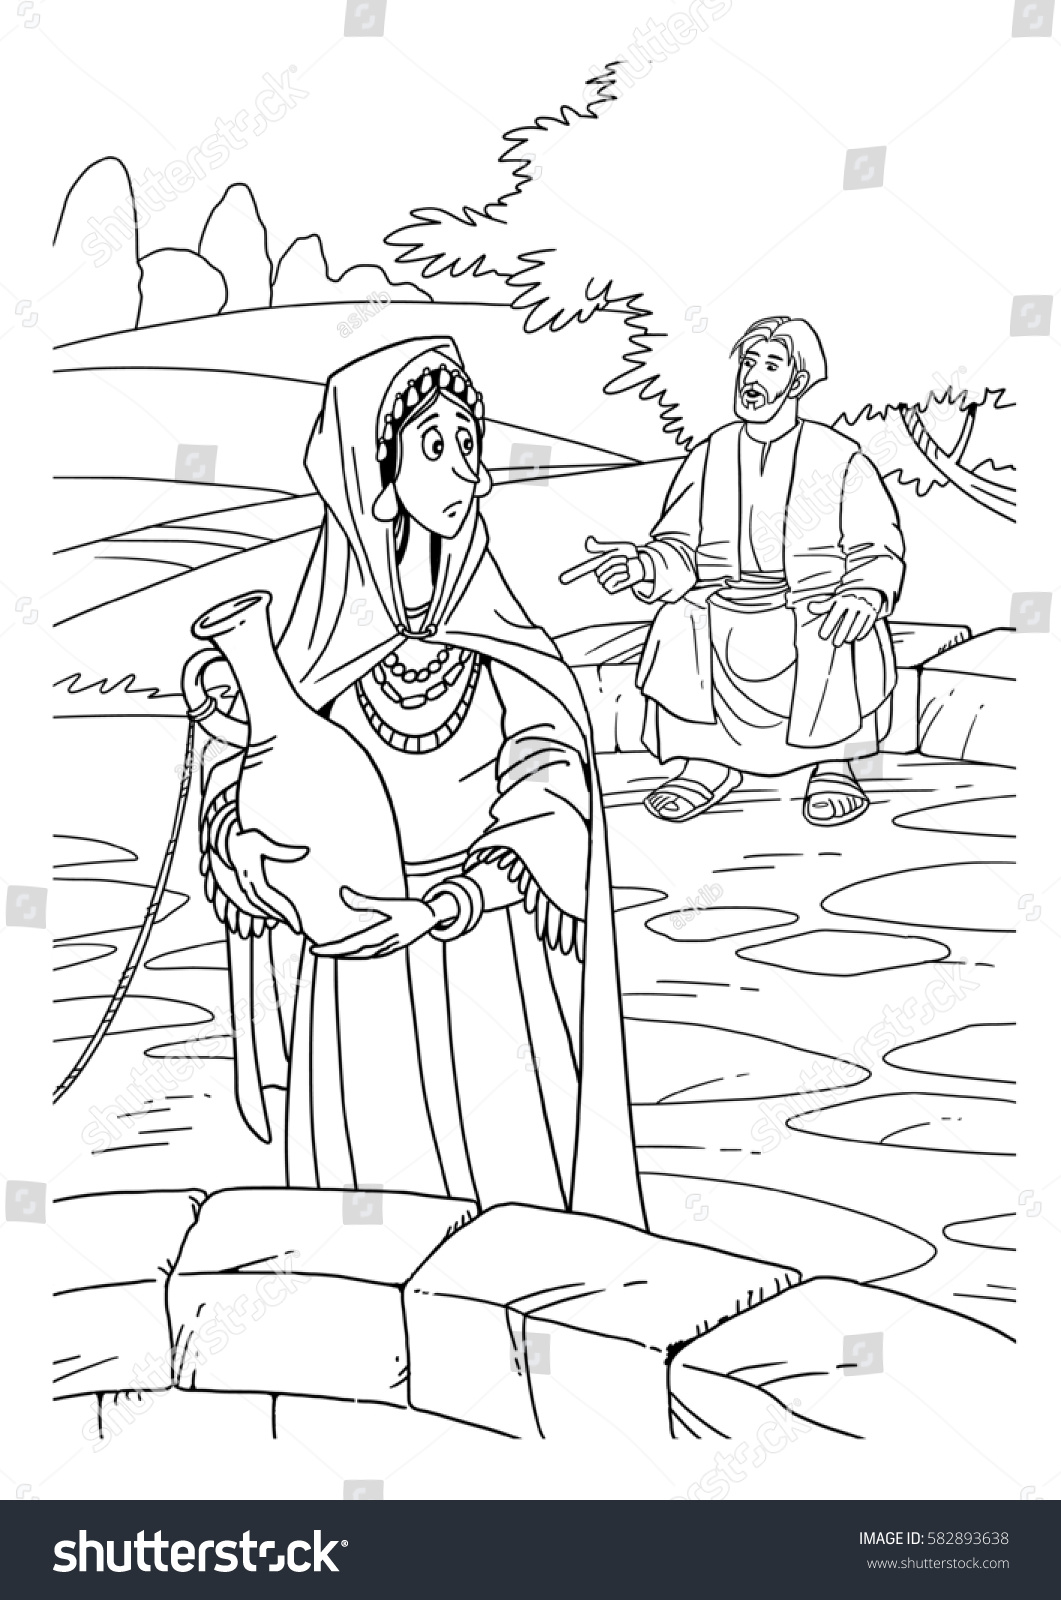 Royalty Free Stock Illustration of Jesus Talking Samaritan Woman ...